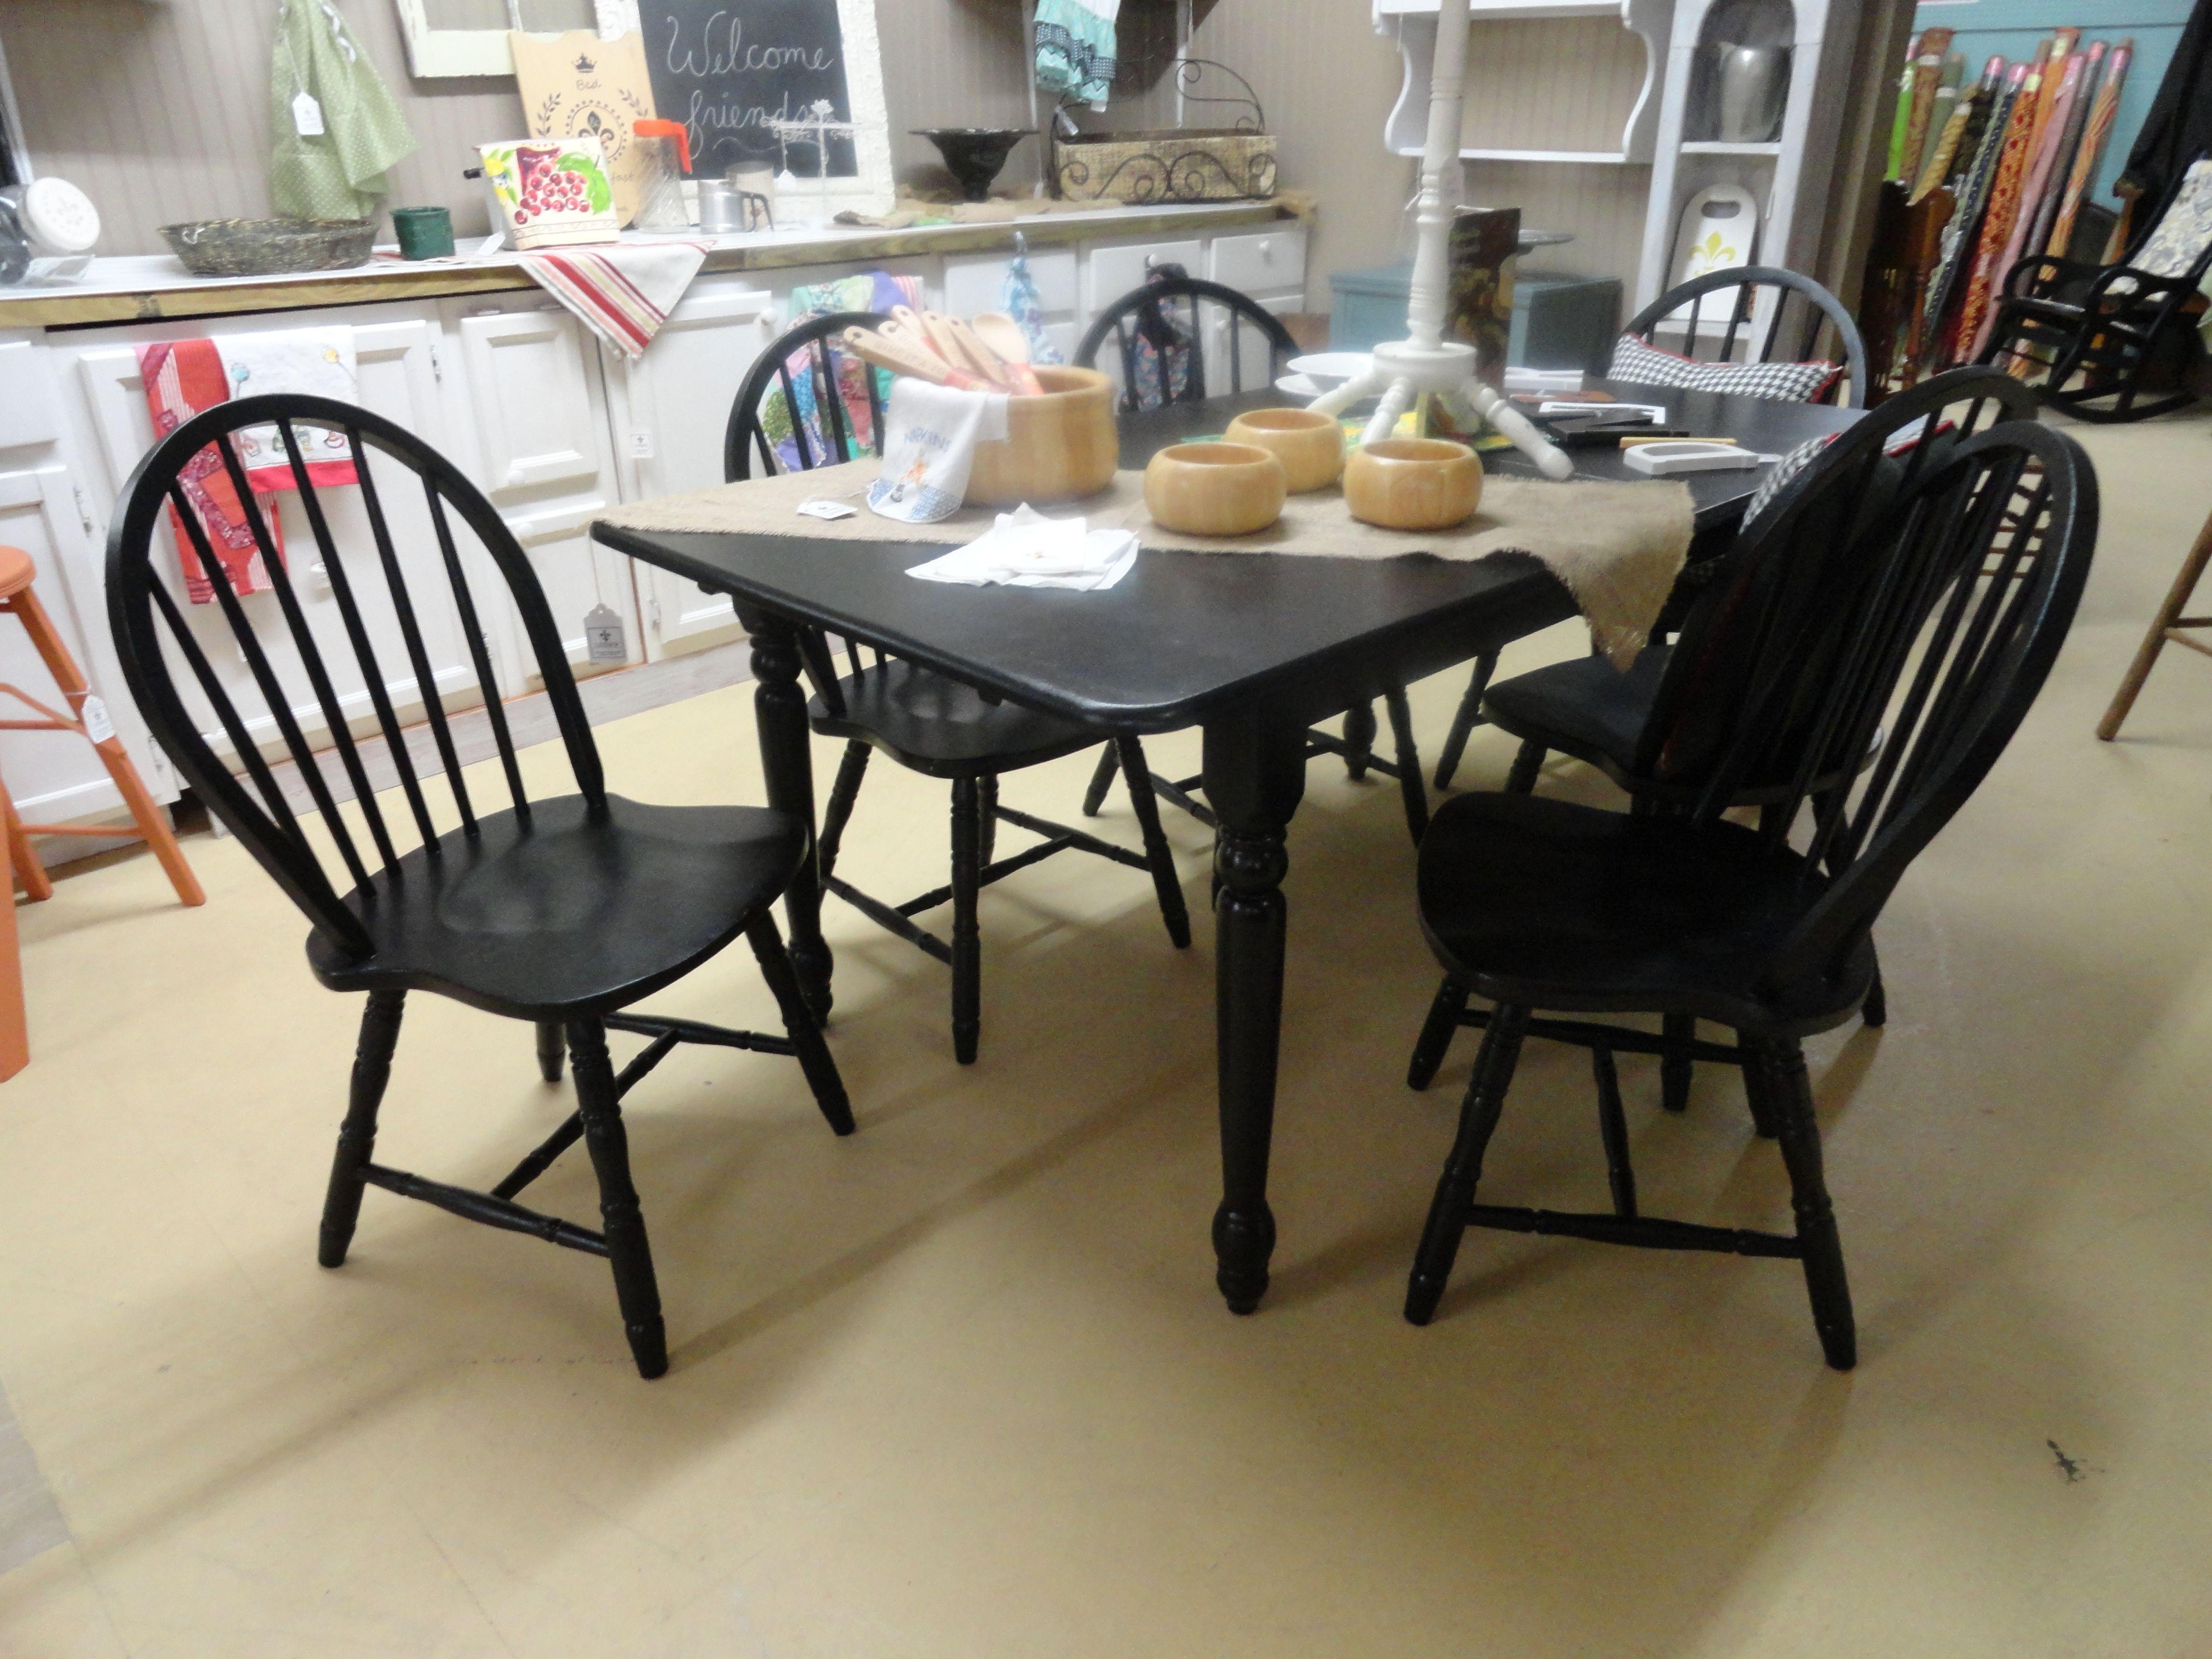 Black farm table 36x66 with selfstoring leaf set has 6